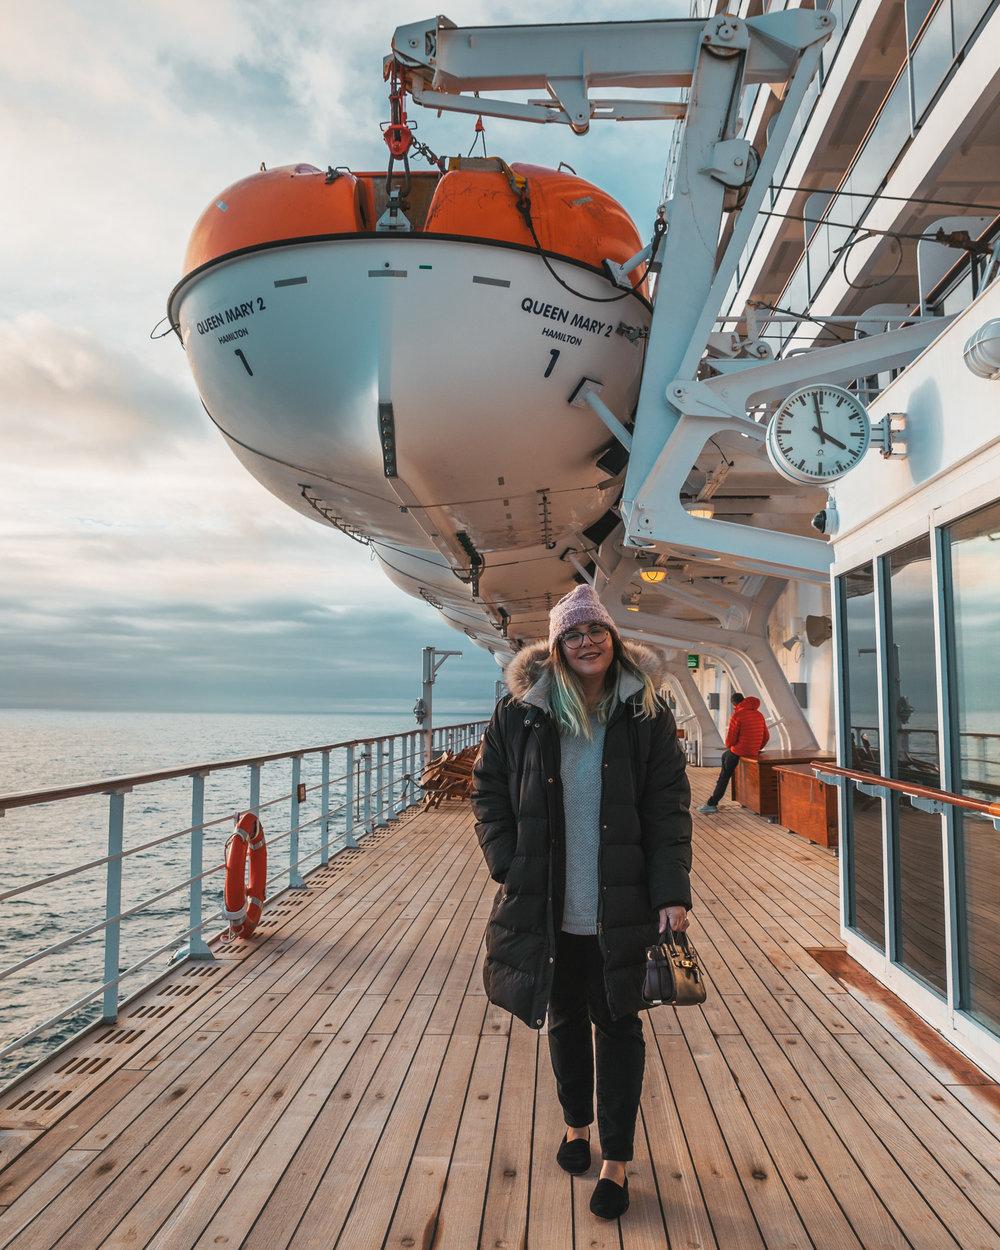 Walking the QM2's decks // Transatlantic Cruising on the Cunard Queen Mary 2 #readysetjetset